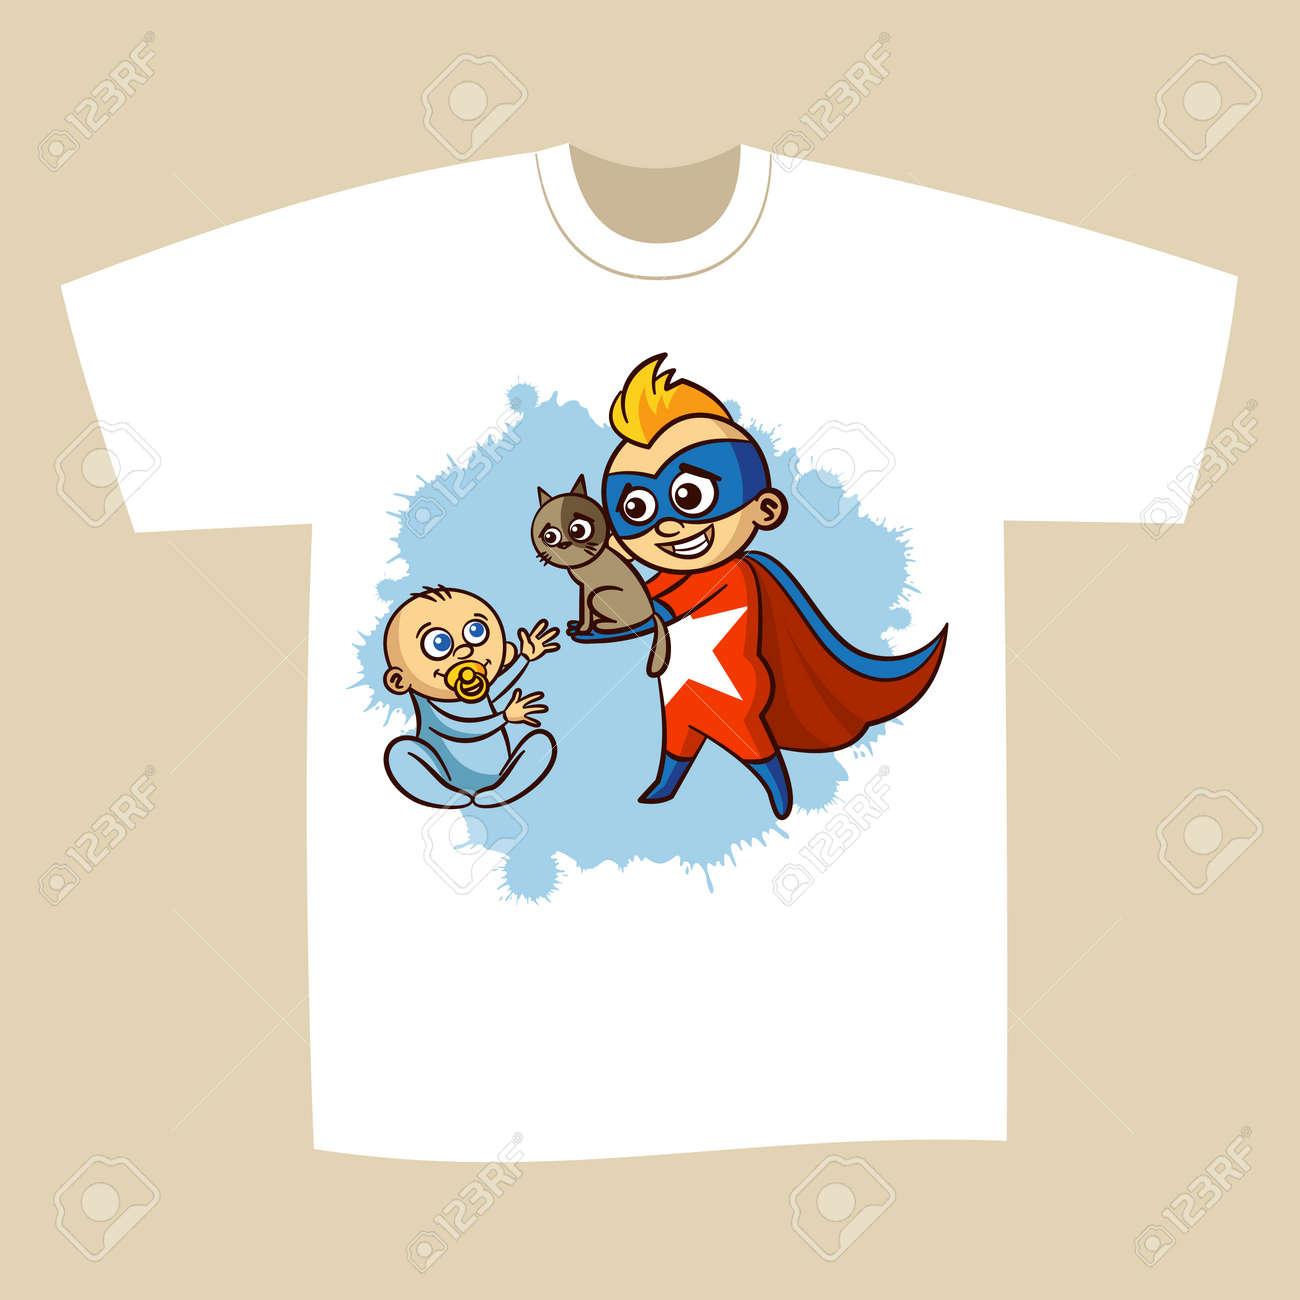 929fe673 T-shirt Print Design Superhero Vector Illustration Stock Vector - 80905494